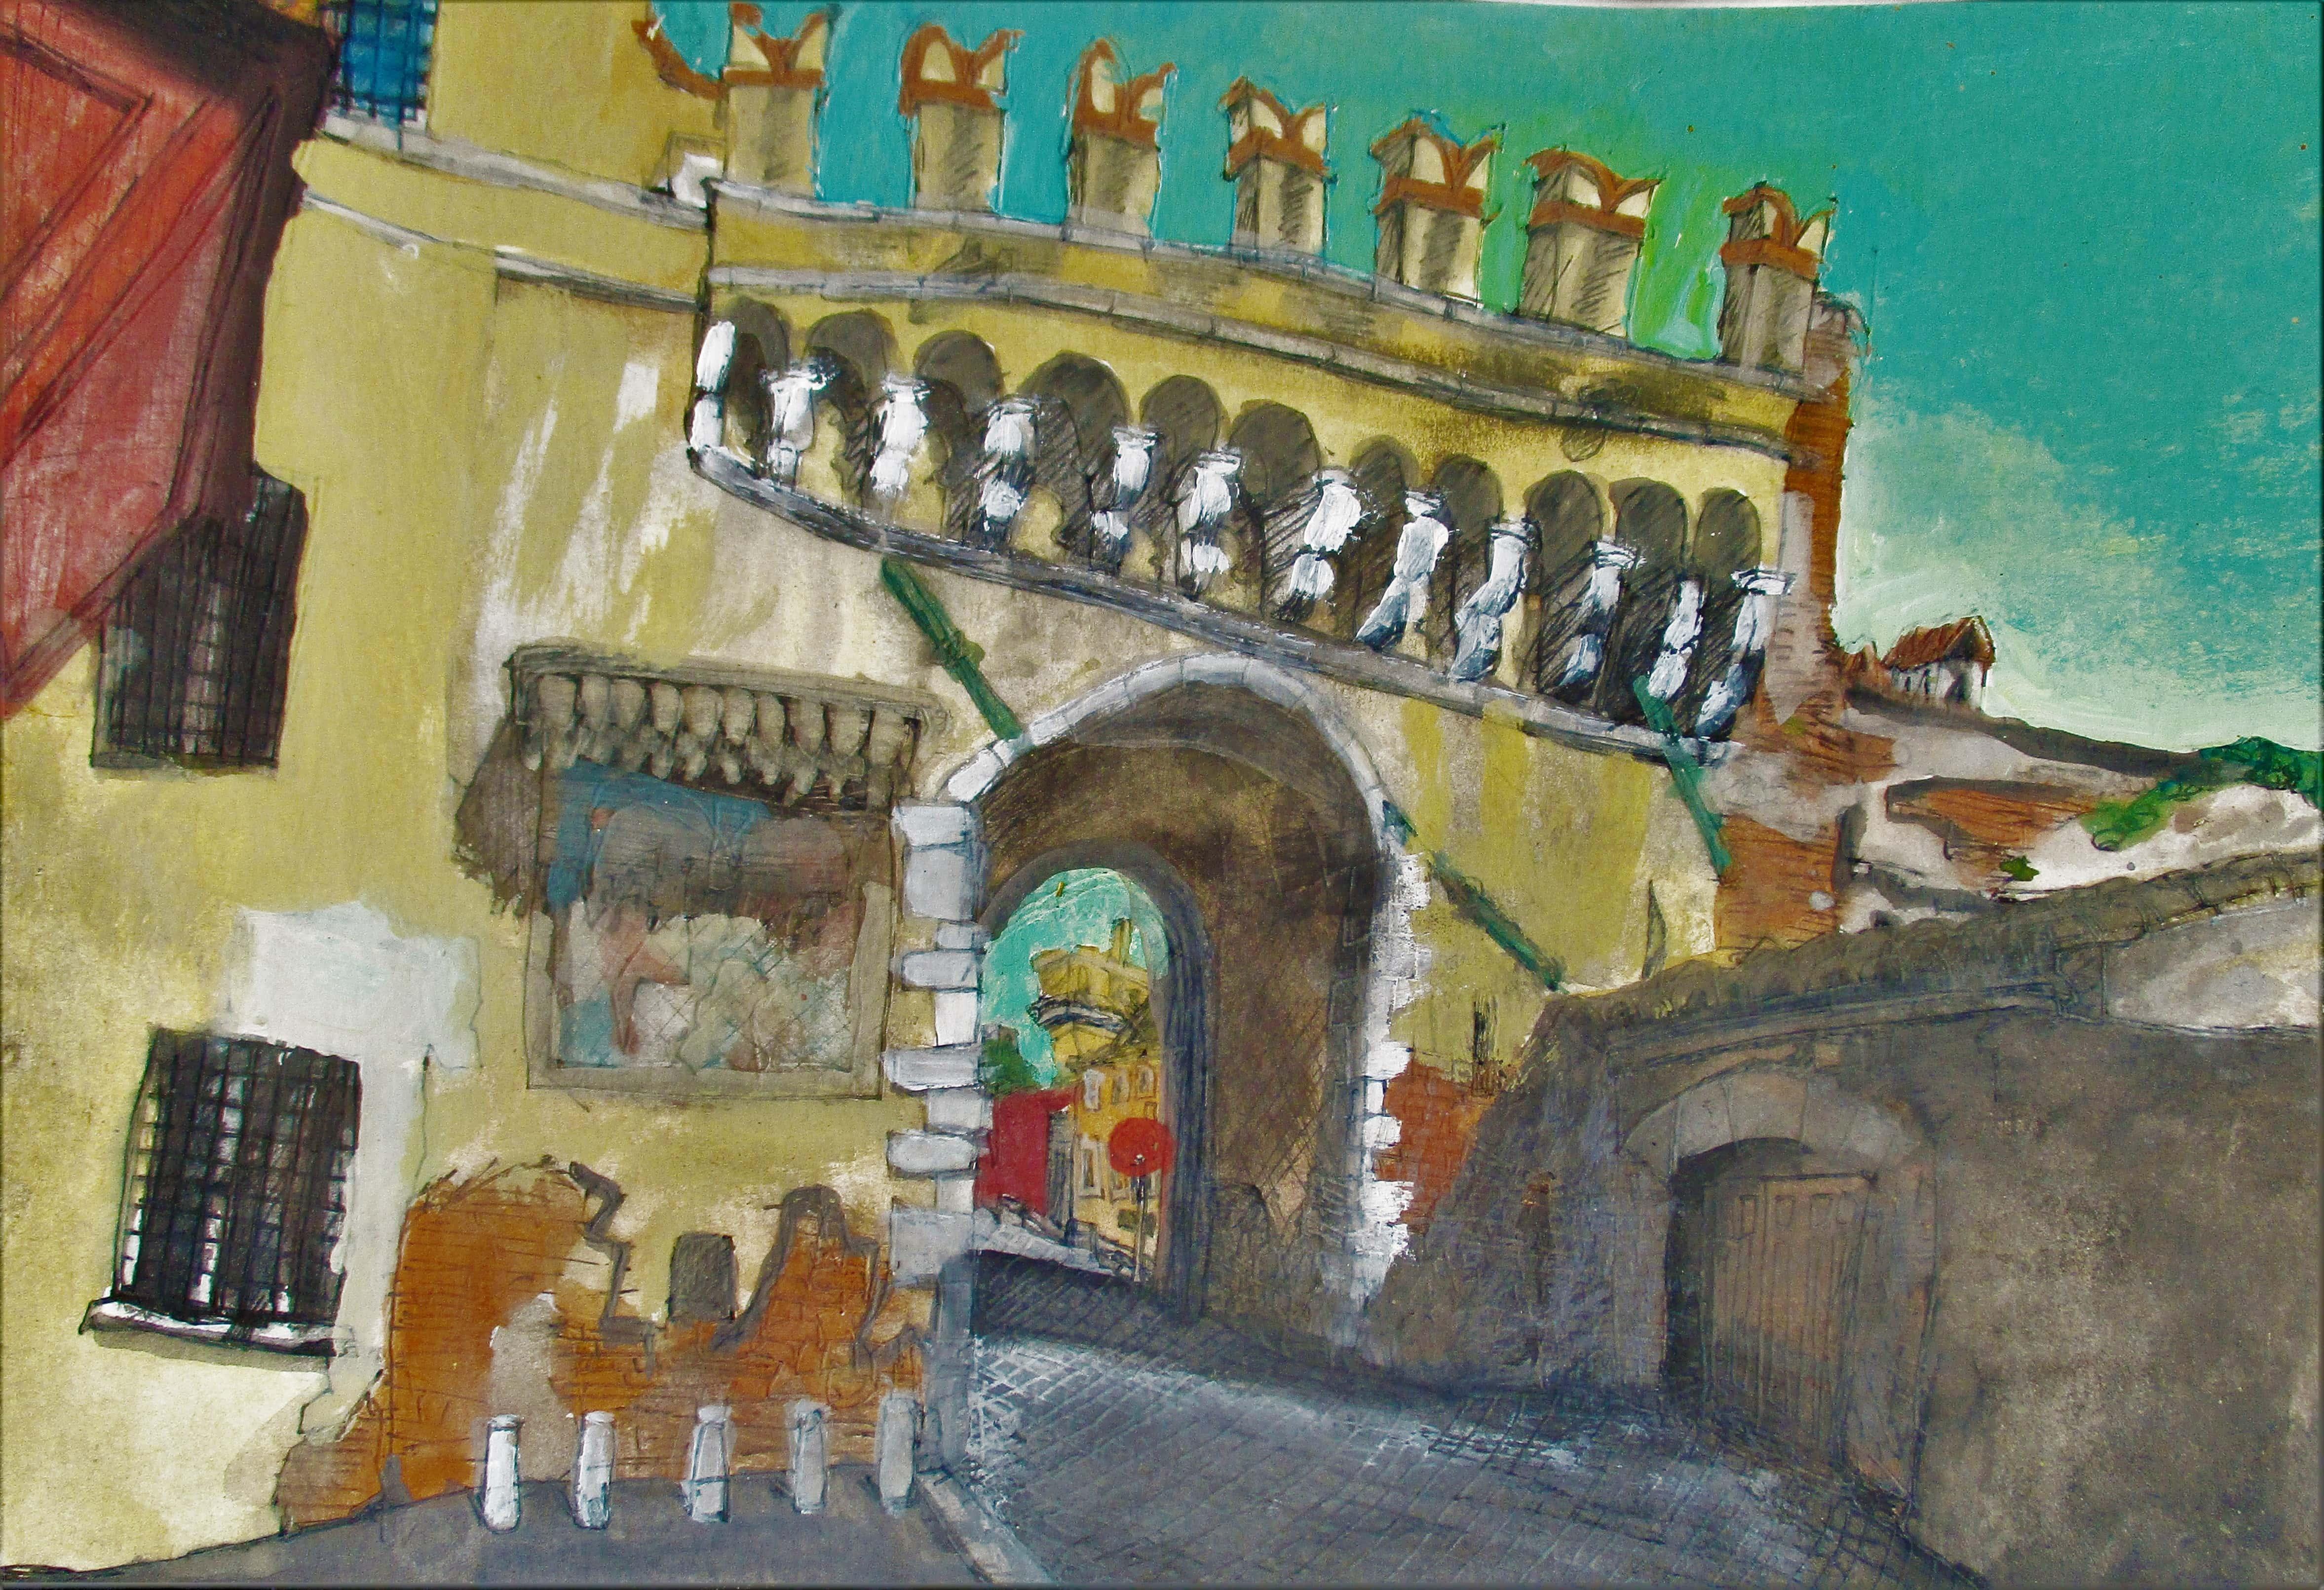 Roma I. Porta Settimiana, Trastevere. Tinta, acuarela y acrílico sobre papel. 21 x 30 cm. 2016.